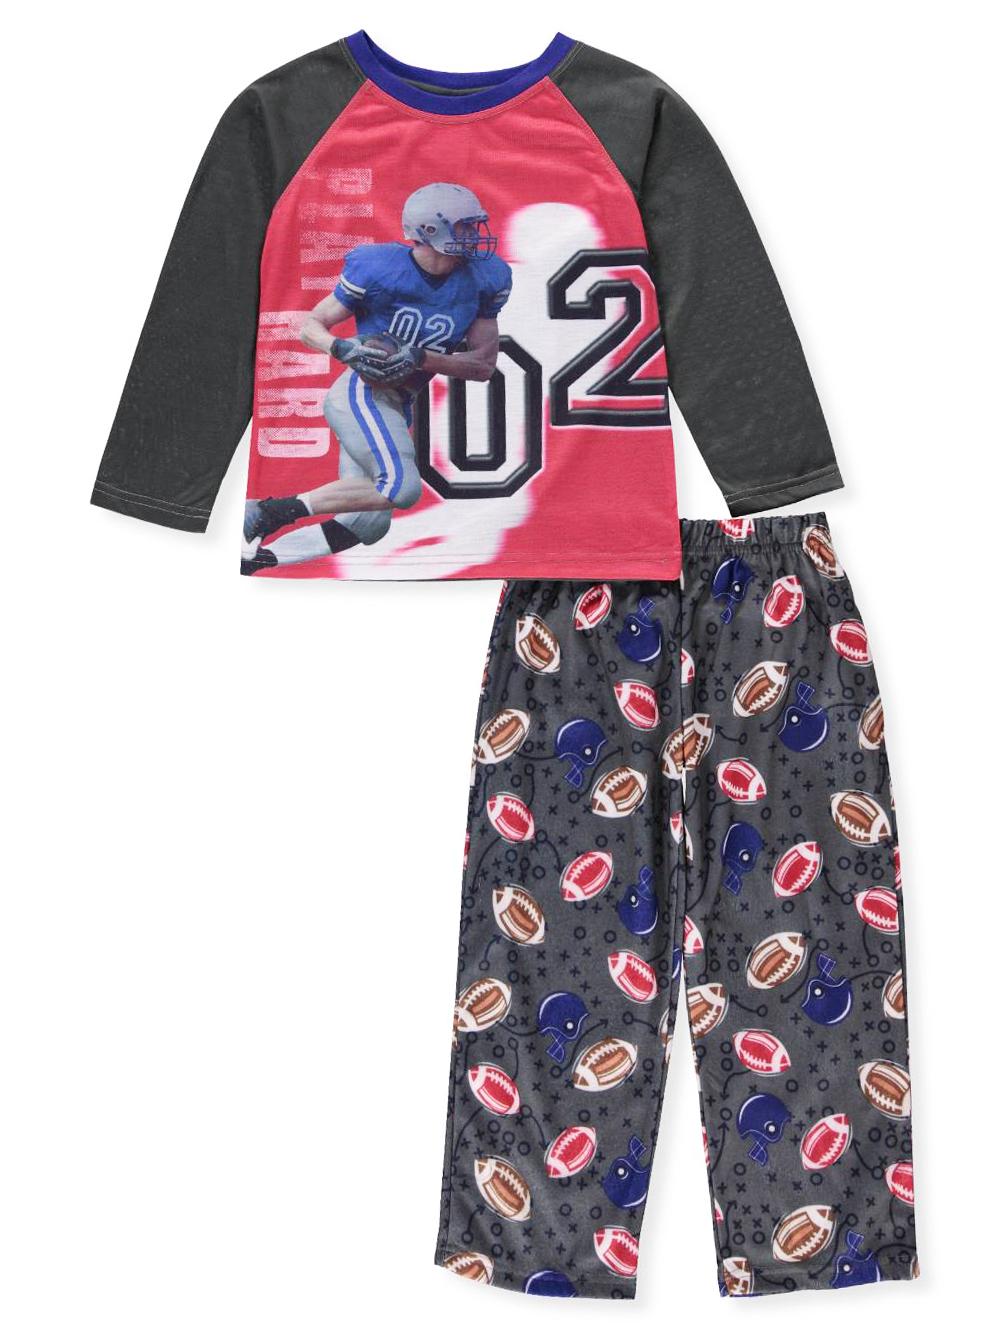 Boys Only Boys 2-Piece Pajama Set with Stickers